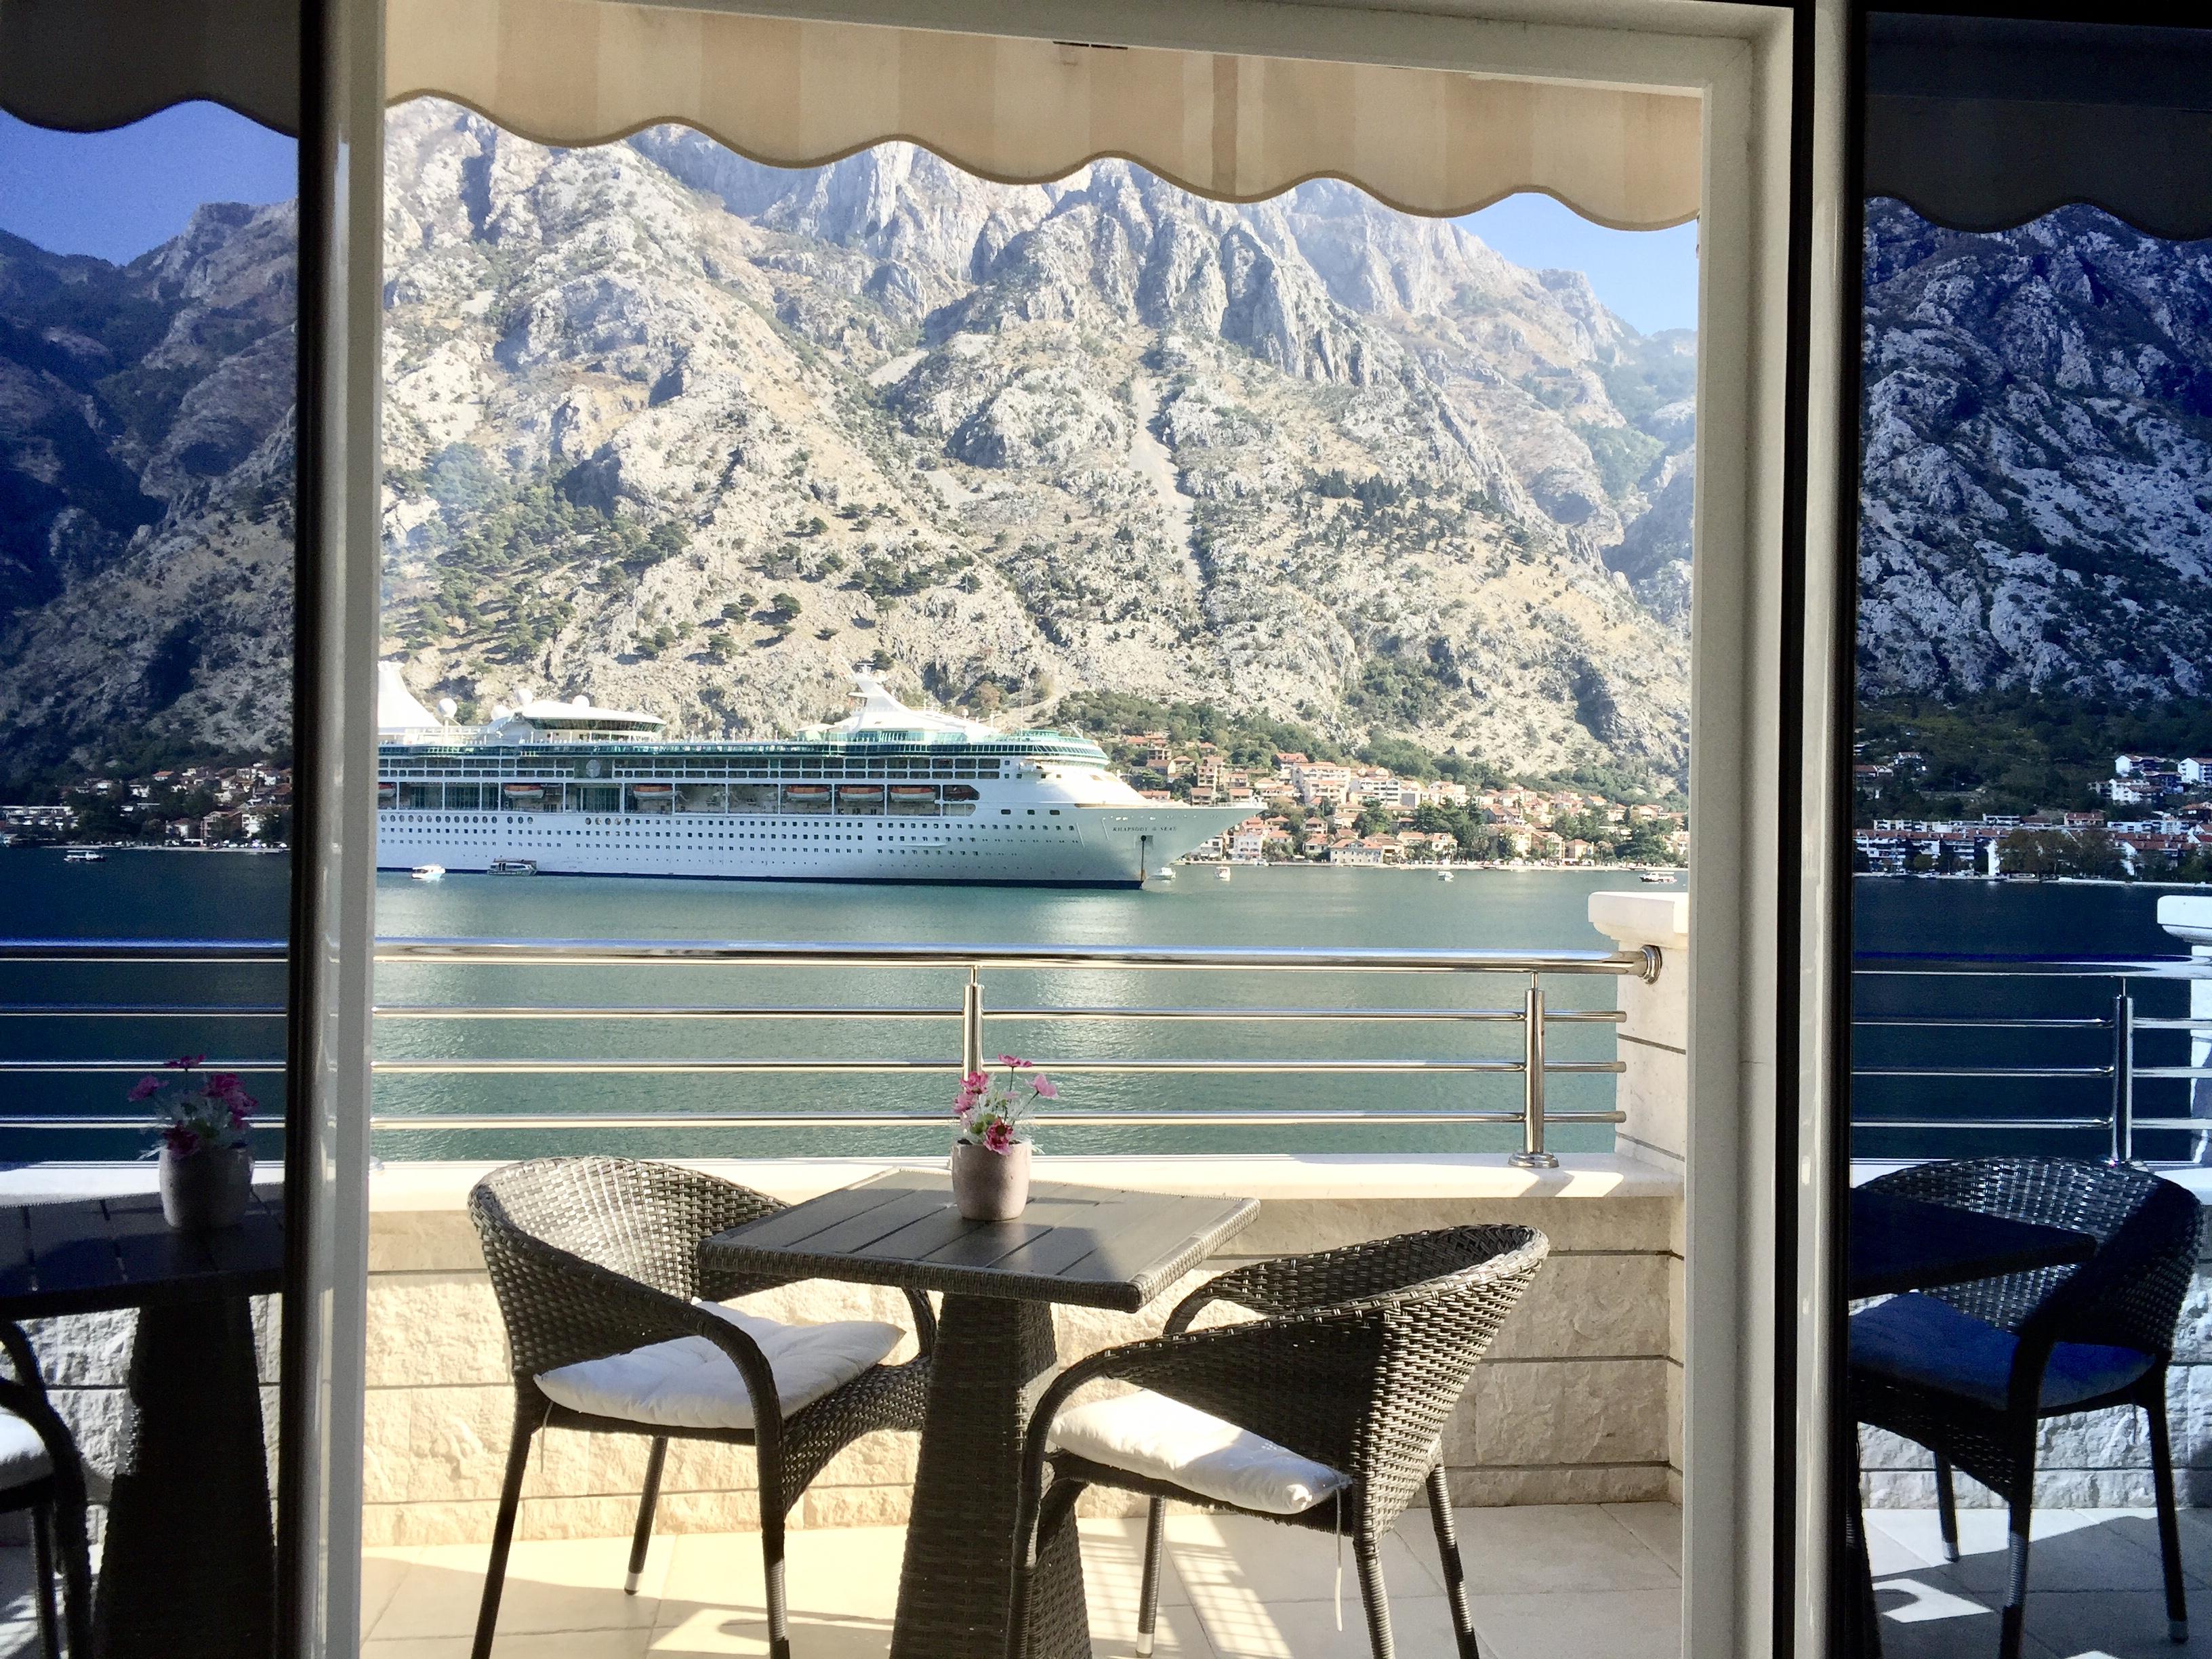 Alltagsträumer - Montenegro - Airbnb